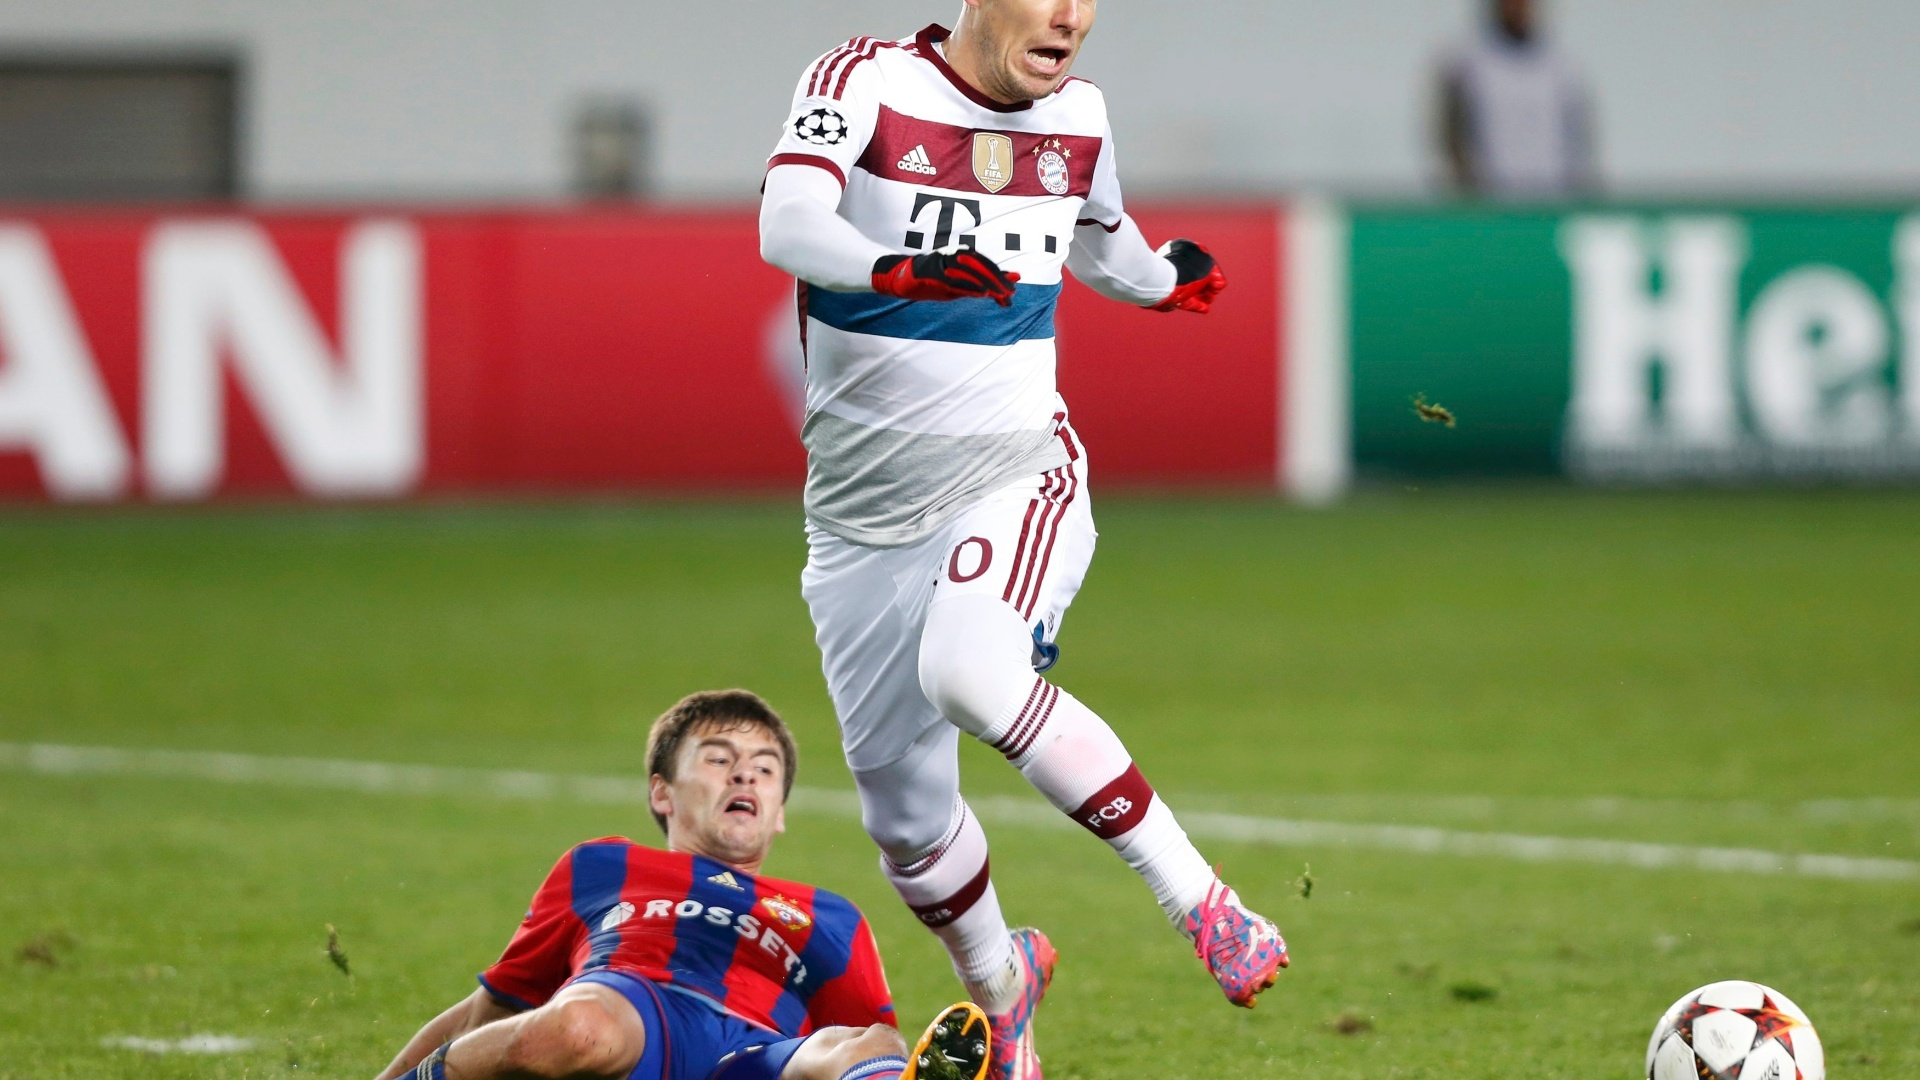 Arjen Robben tenta permanecer na jogada mesmo após entrada de carrinho de jogador do CSKA